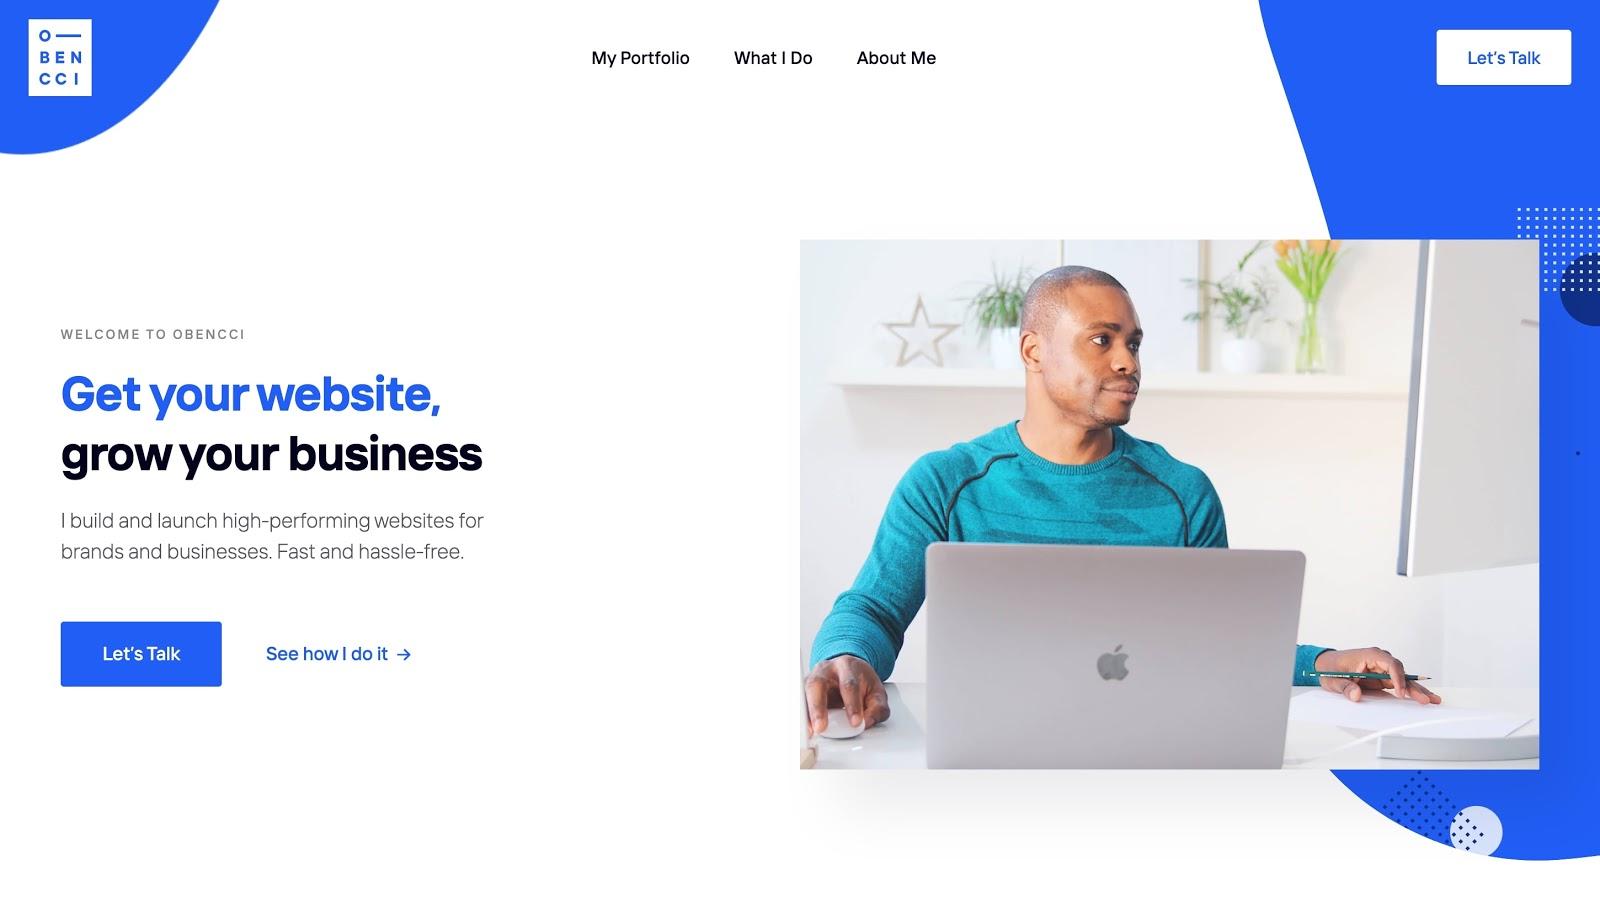 An image of Obencci's website.